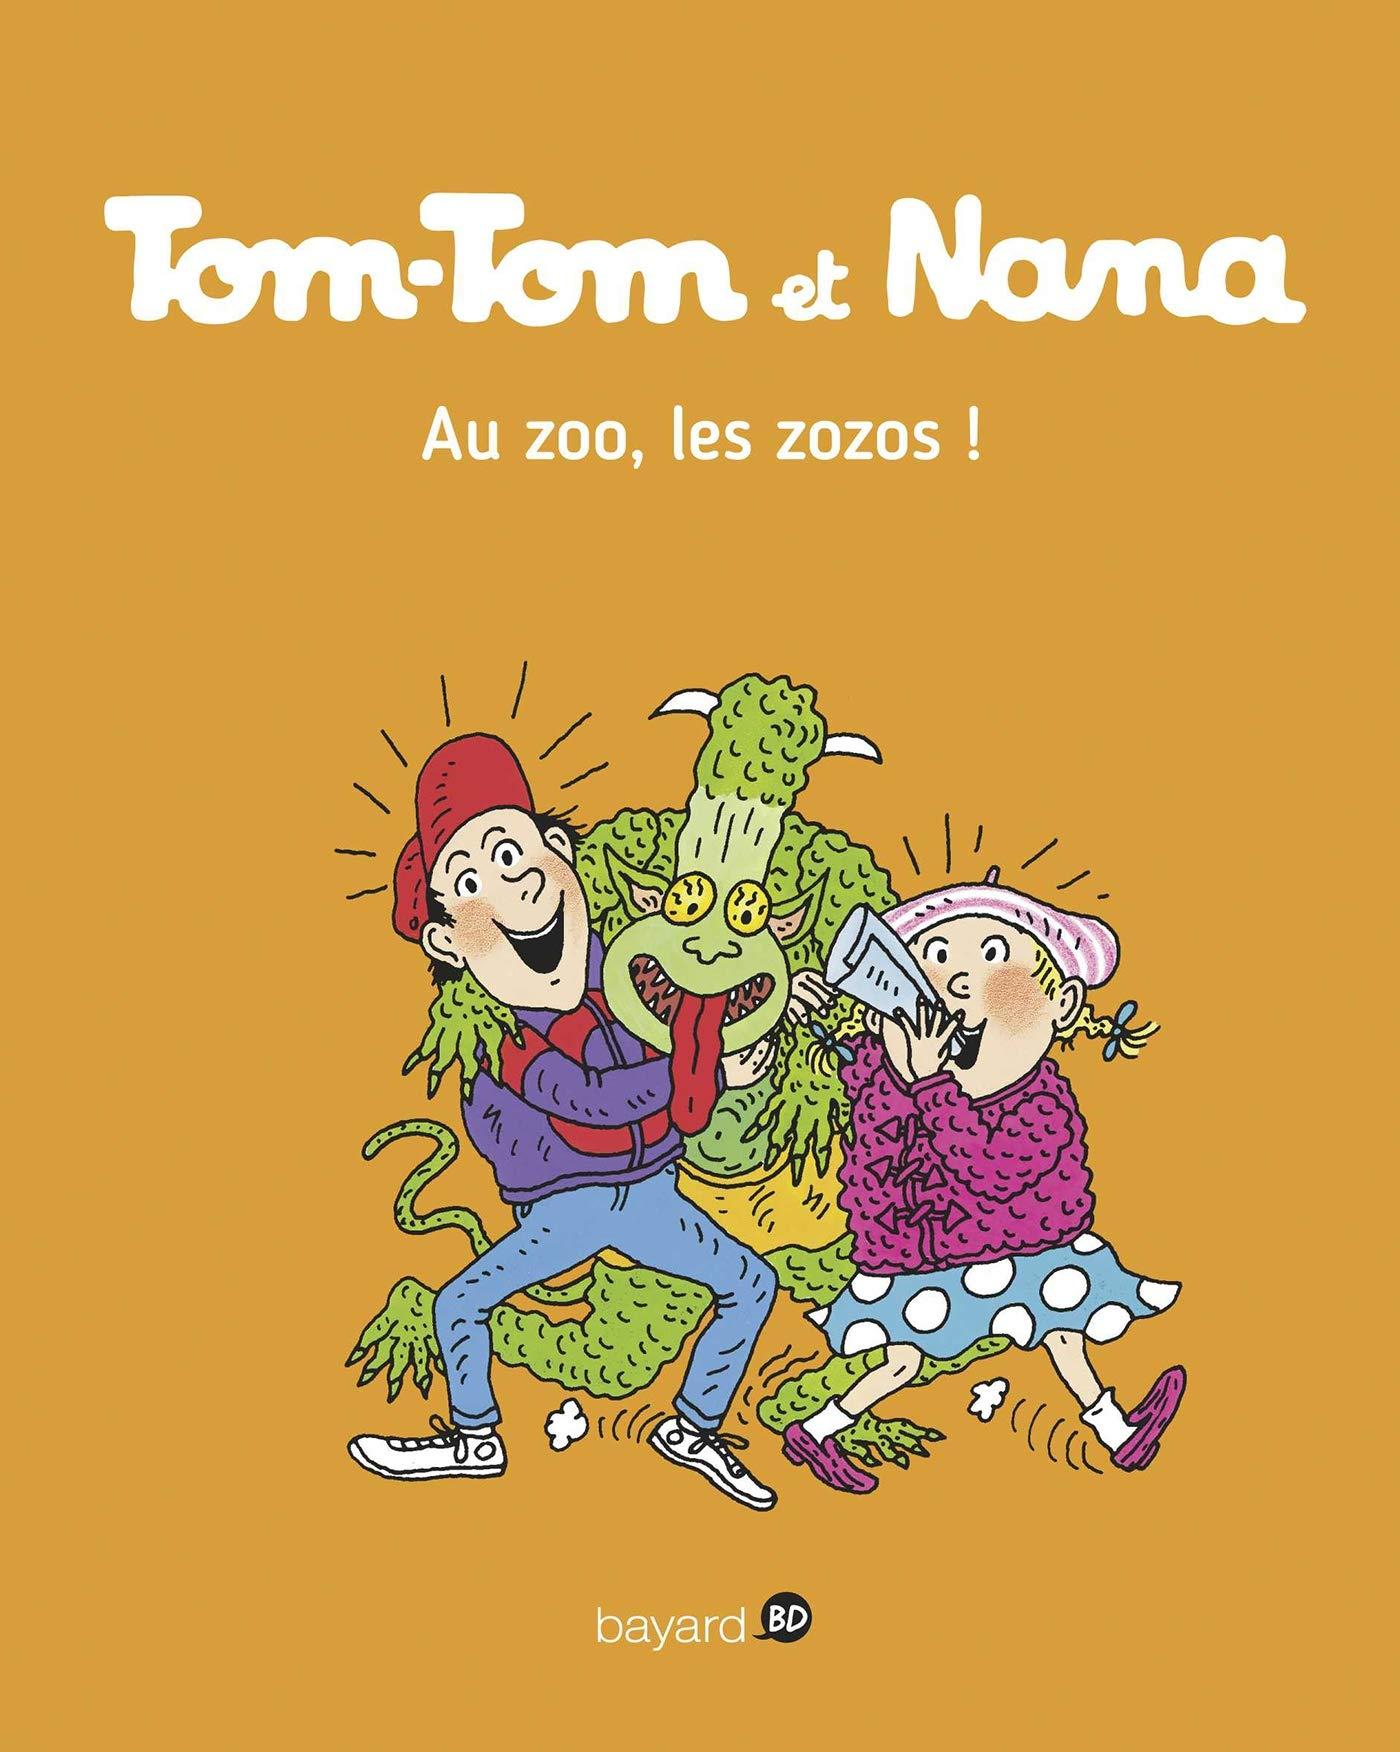 Tom-Tom et Nana, Tome 24: Au zoo les zozos ! (Tom-Tom et Nana (24))